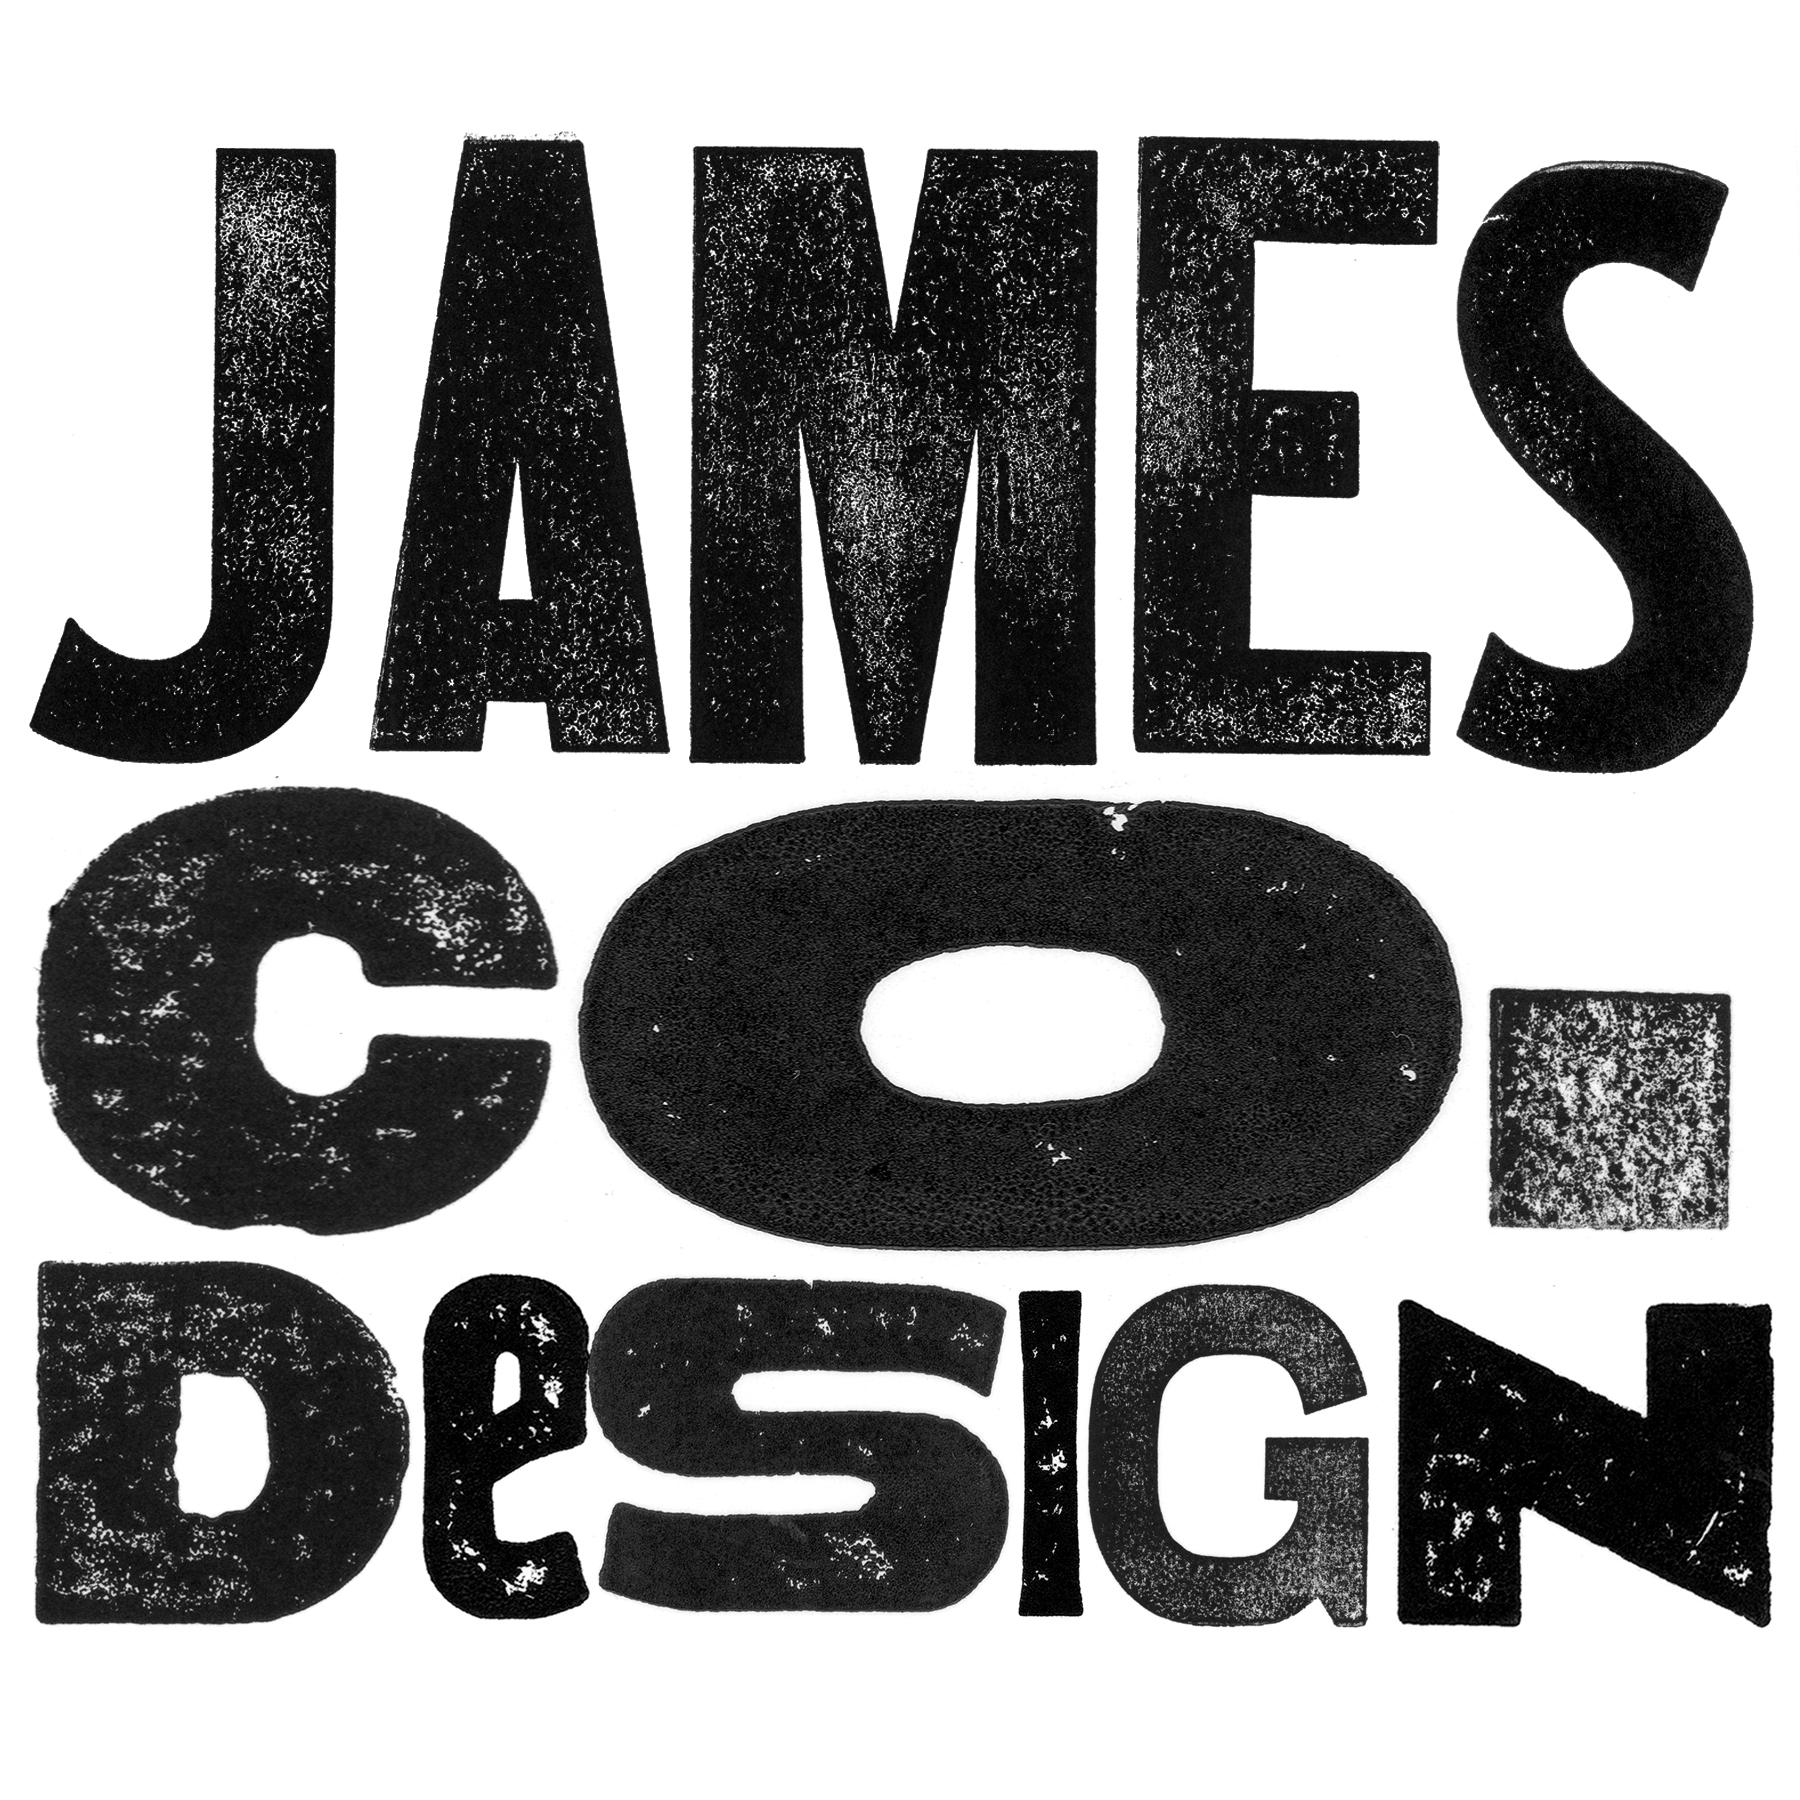 James Co. Design on LogoLounge